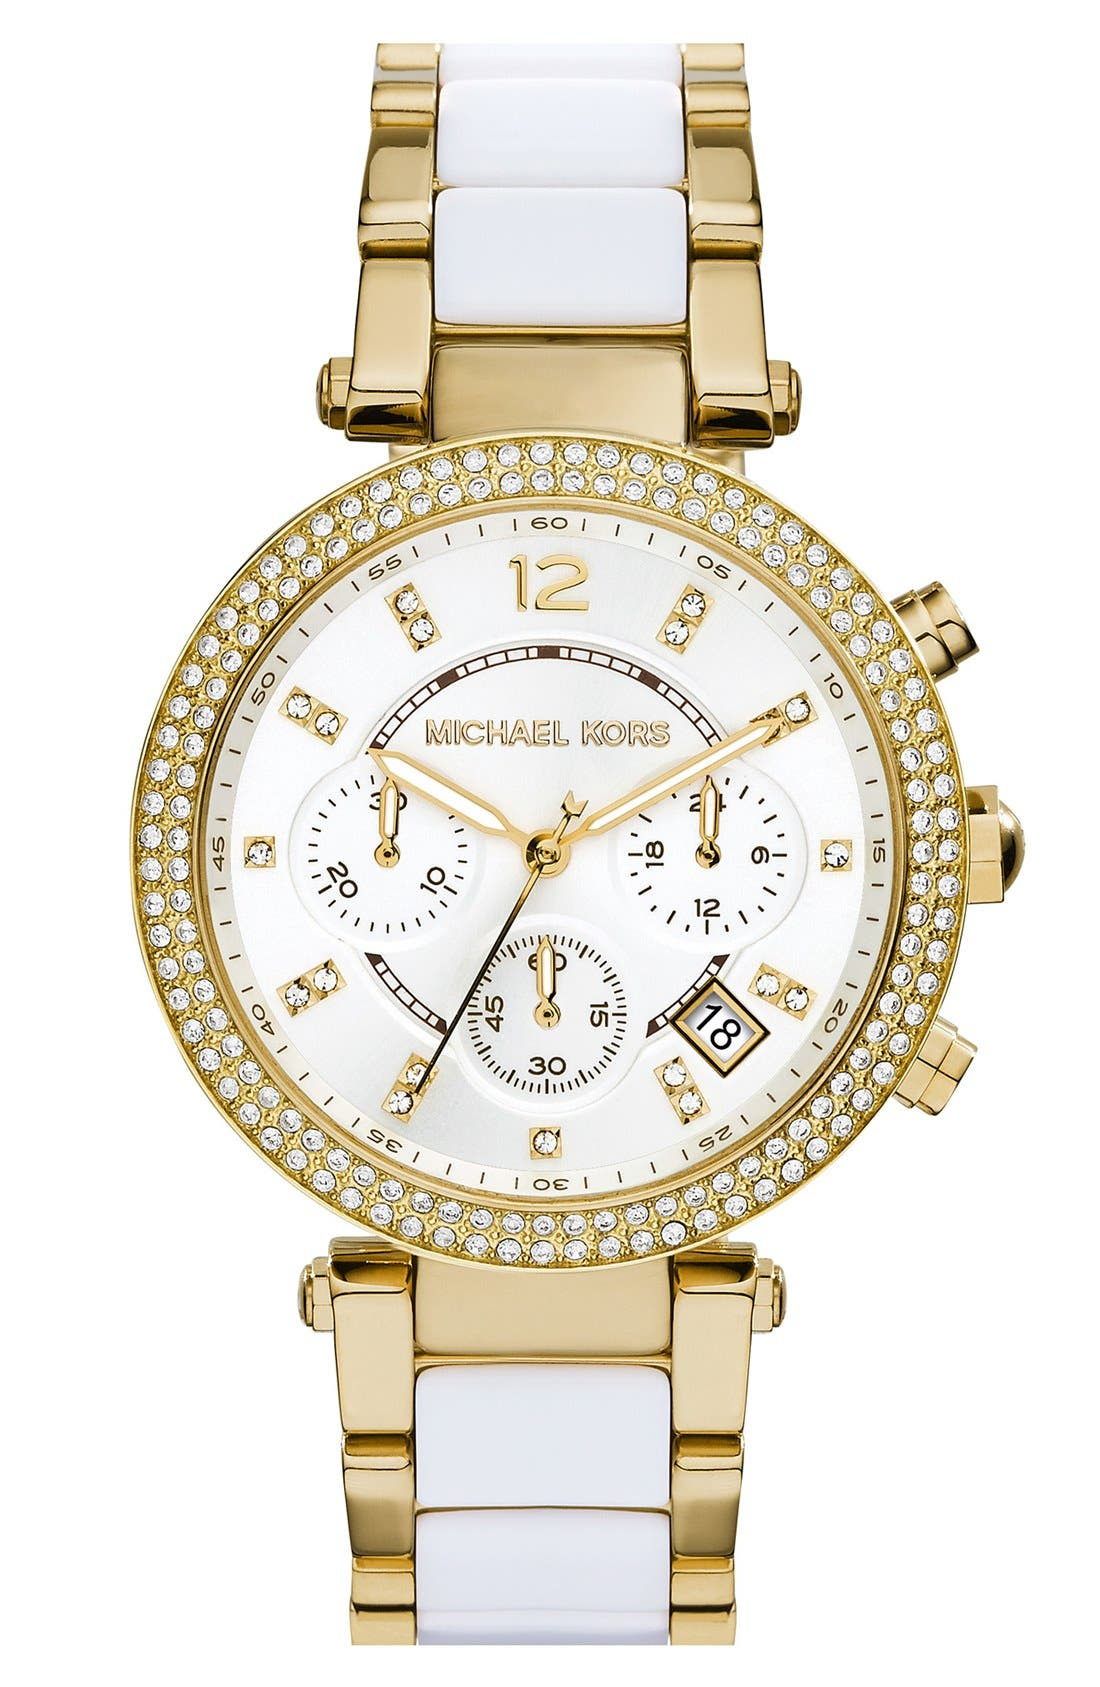 Main Image - Michael Kors 'Parker' Chronograph Watch, 39mm